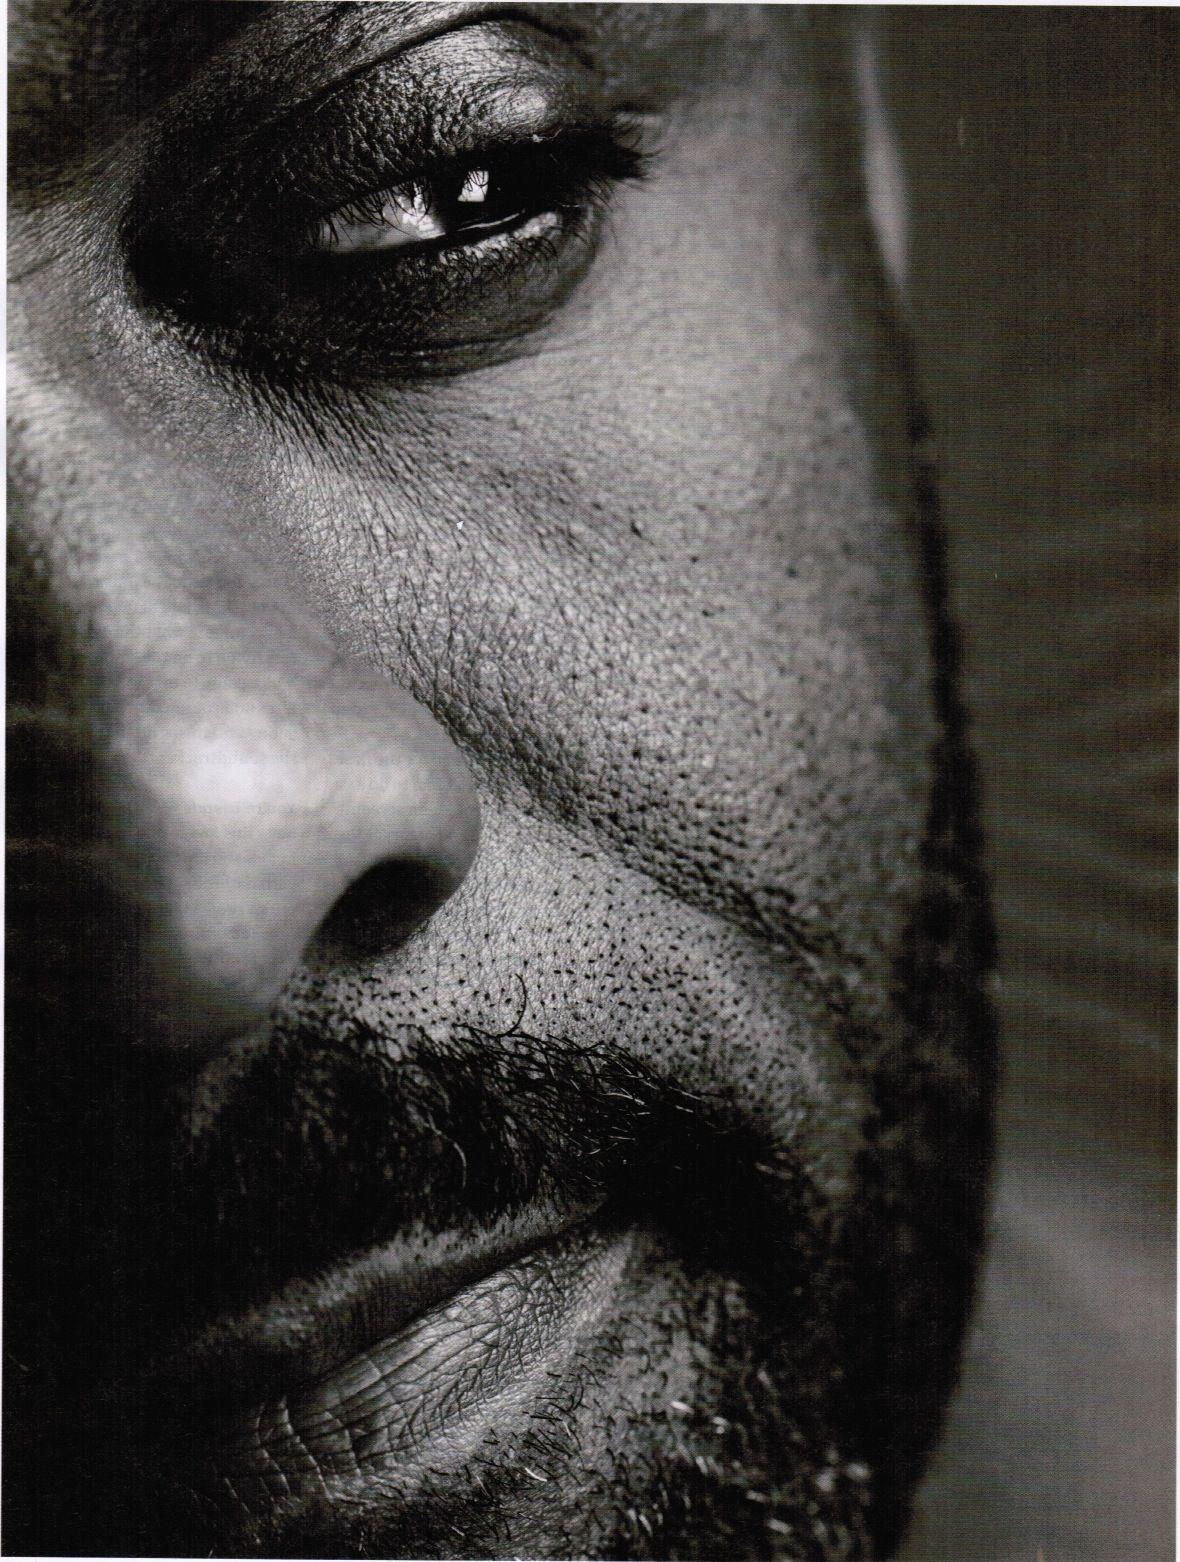 Pin By Lj On Love Marriage Idris Elba Elba Beautiful Men